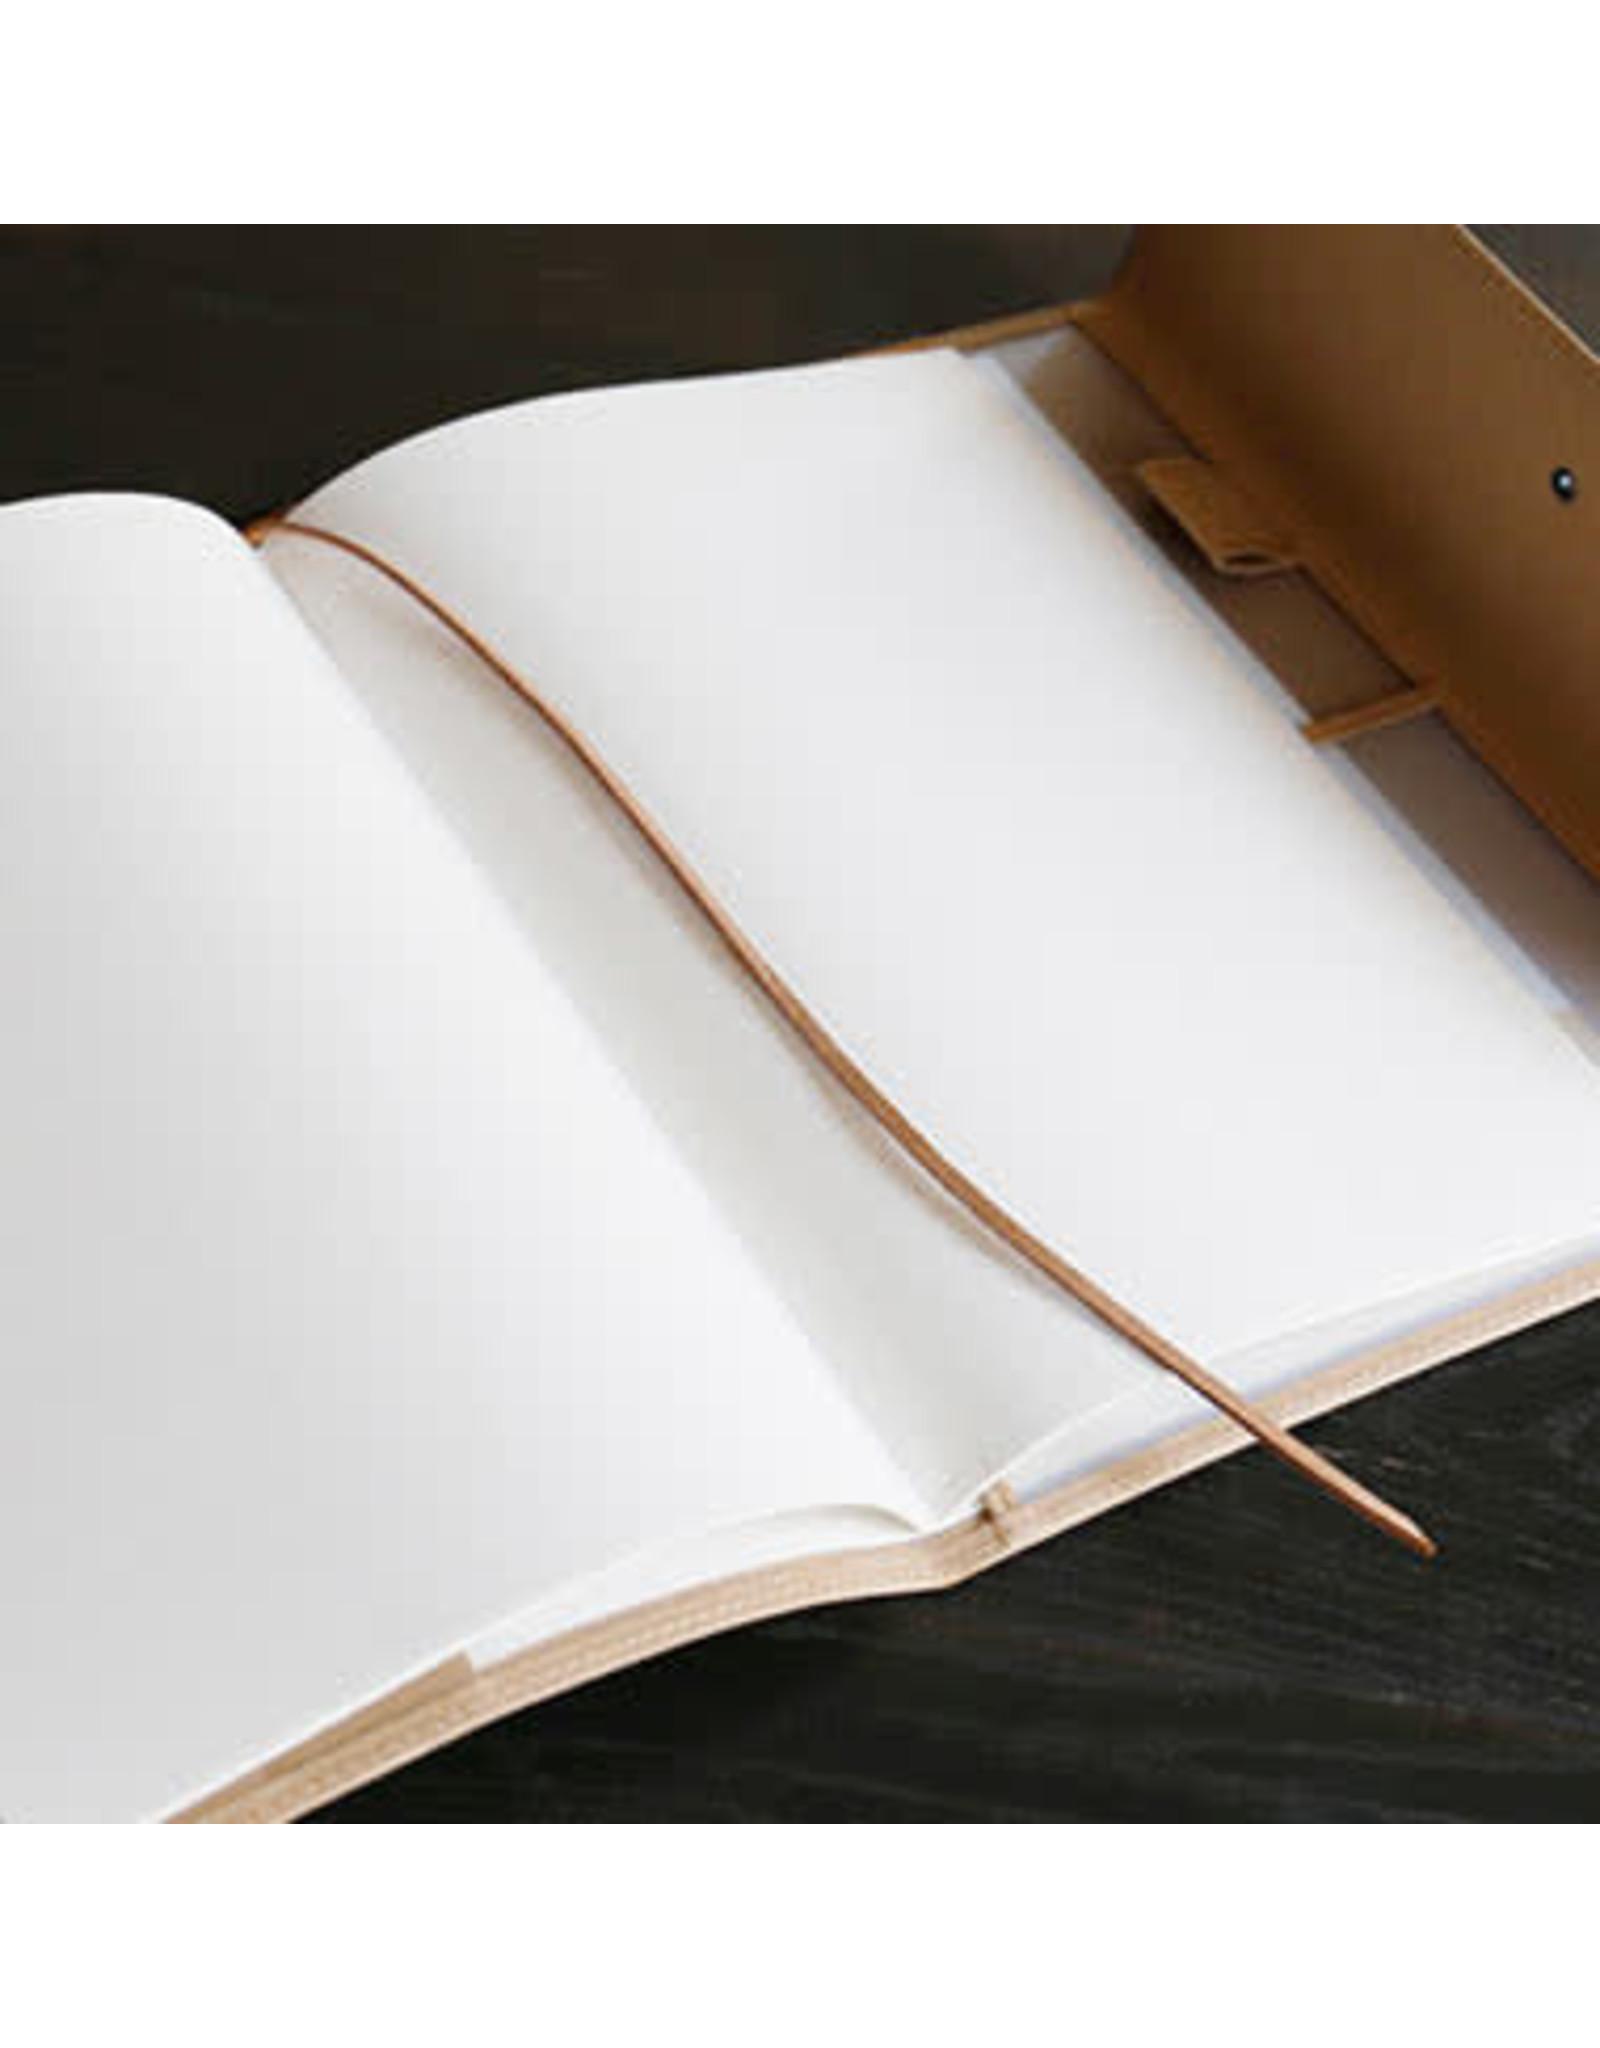 KING JIM CO., LTD. KRAFT PLASTIC FILE HOLDER COVER A4 GREY